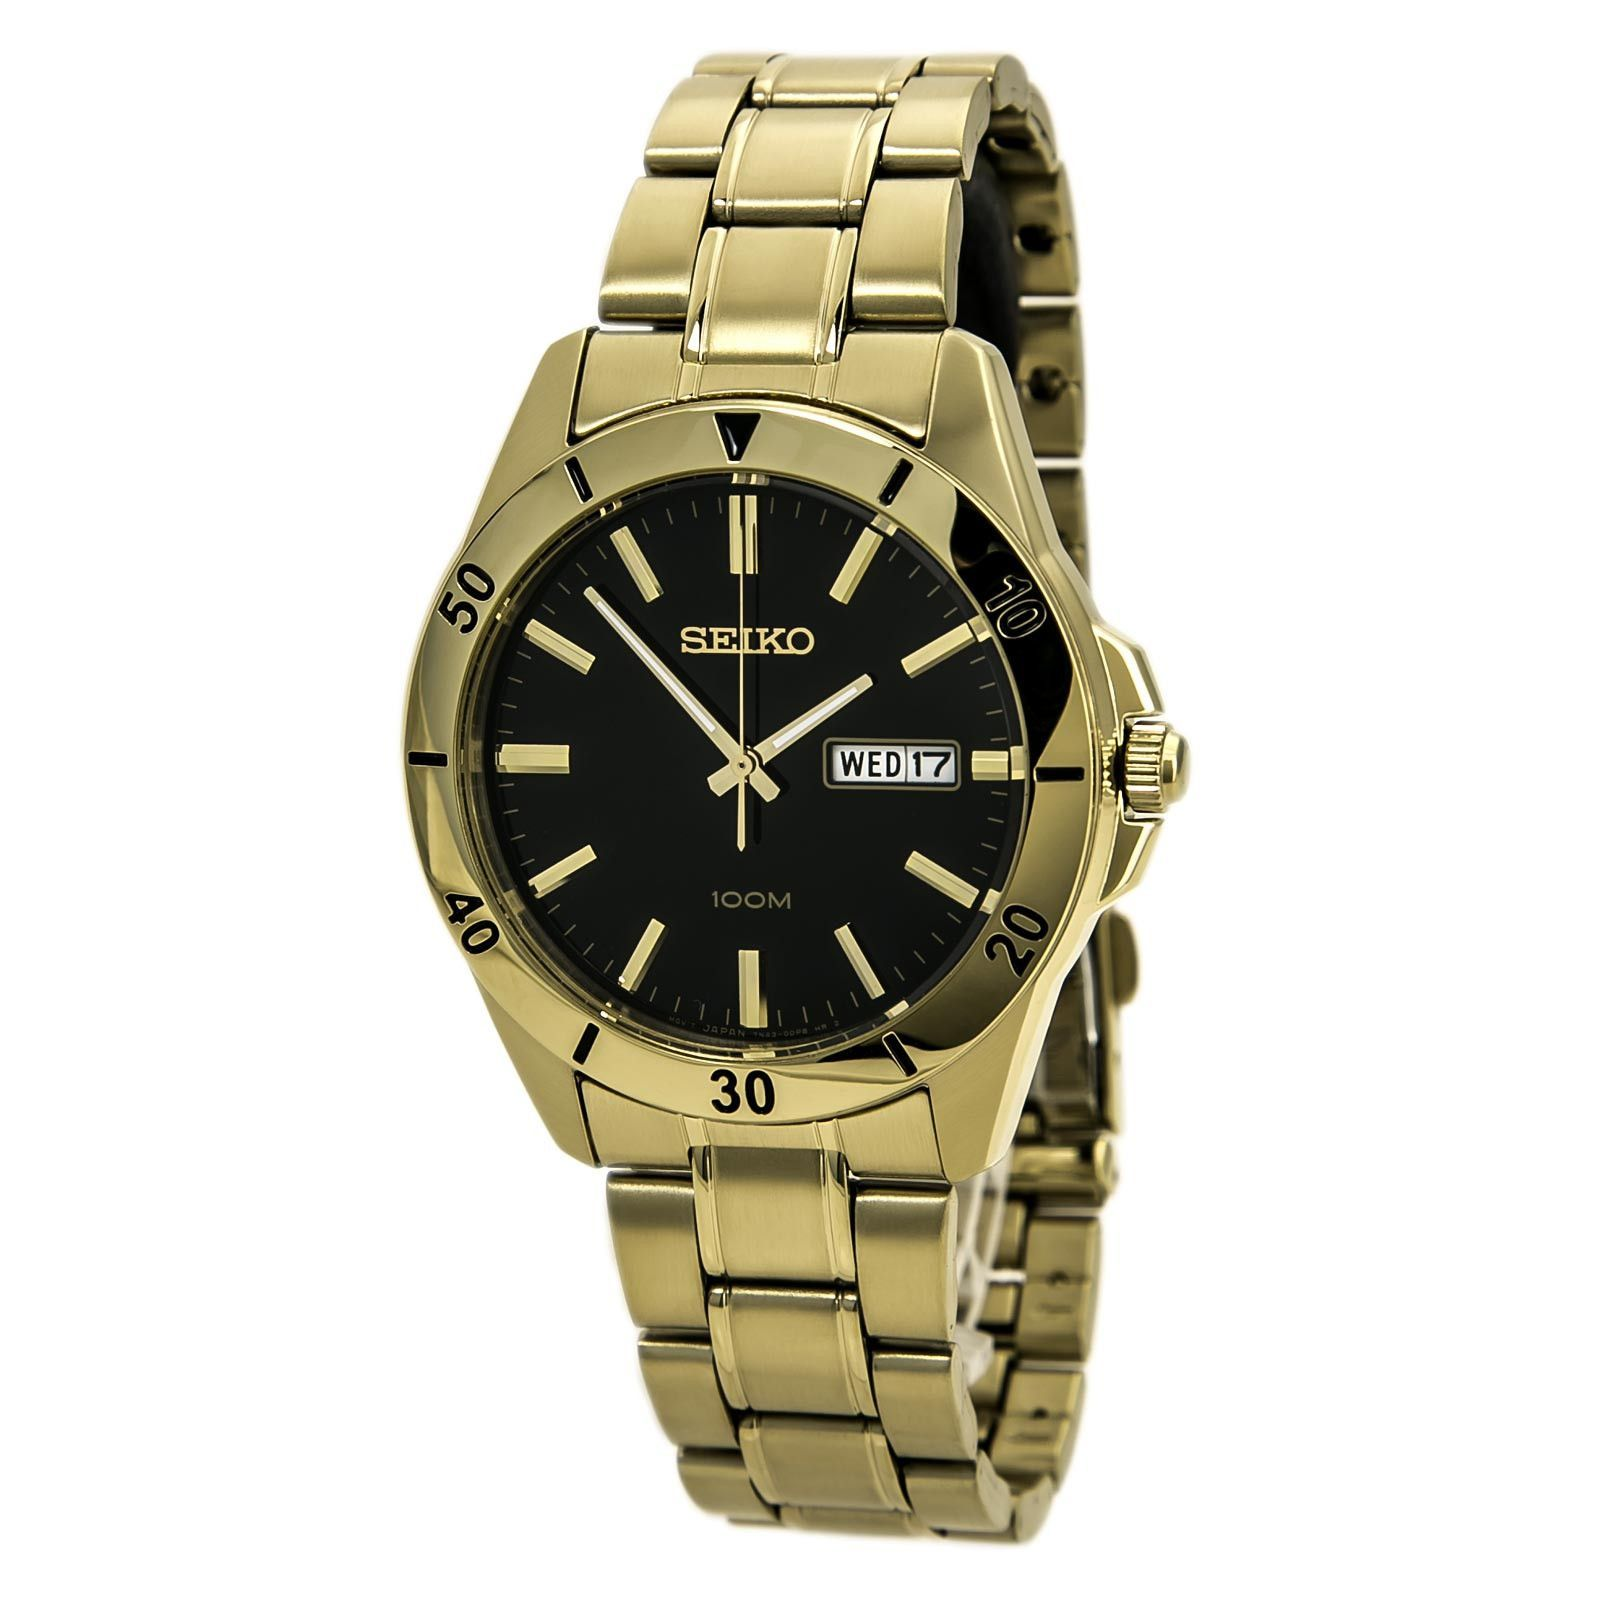 Seiko SGGA86 Men's Special Value Sports Black Dial Gold Plated Steel Bracelet Quartz Watch